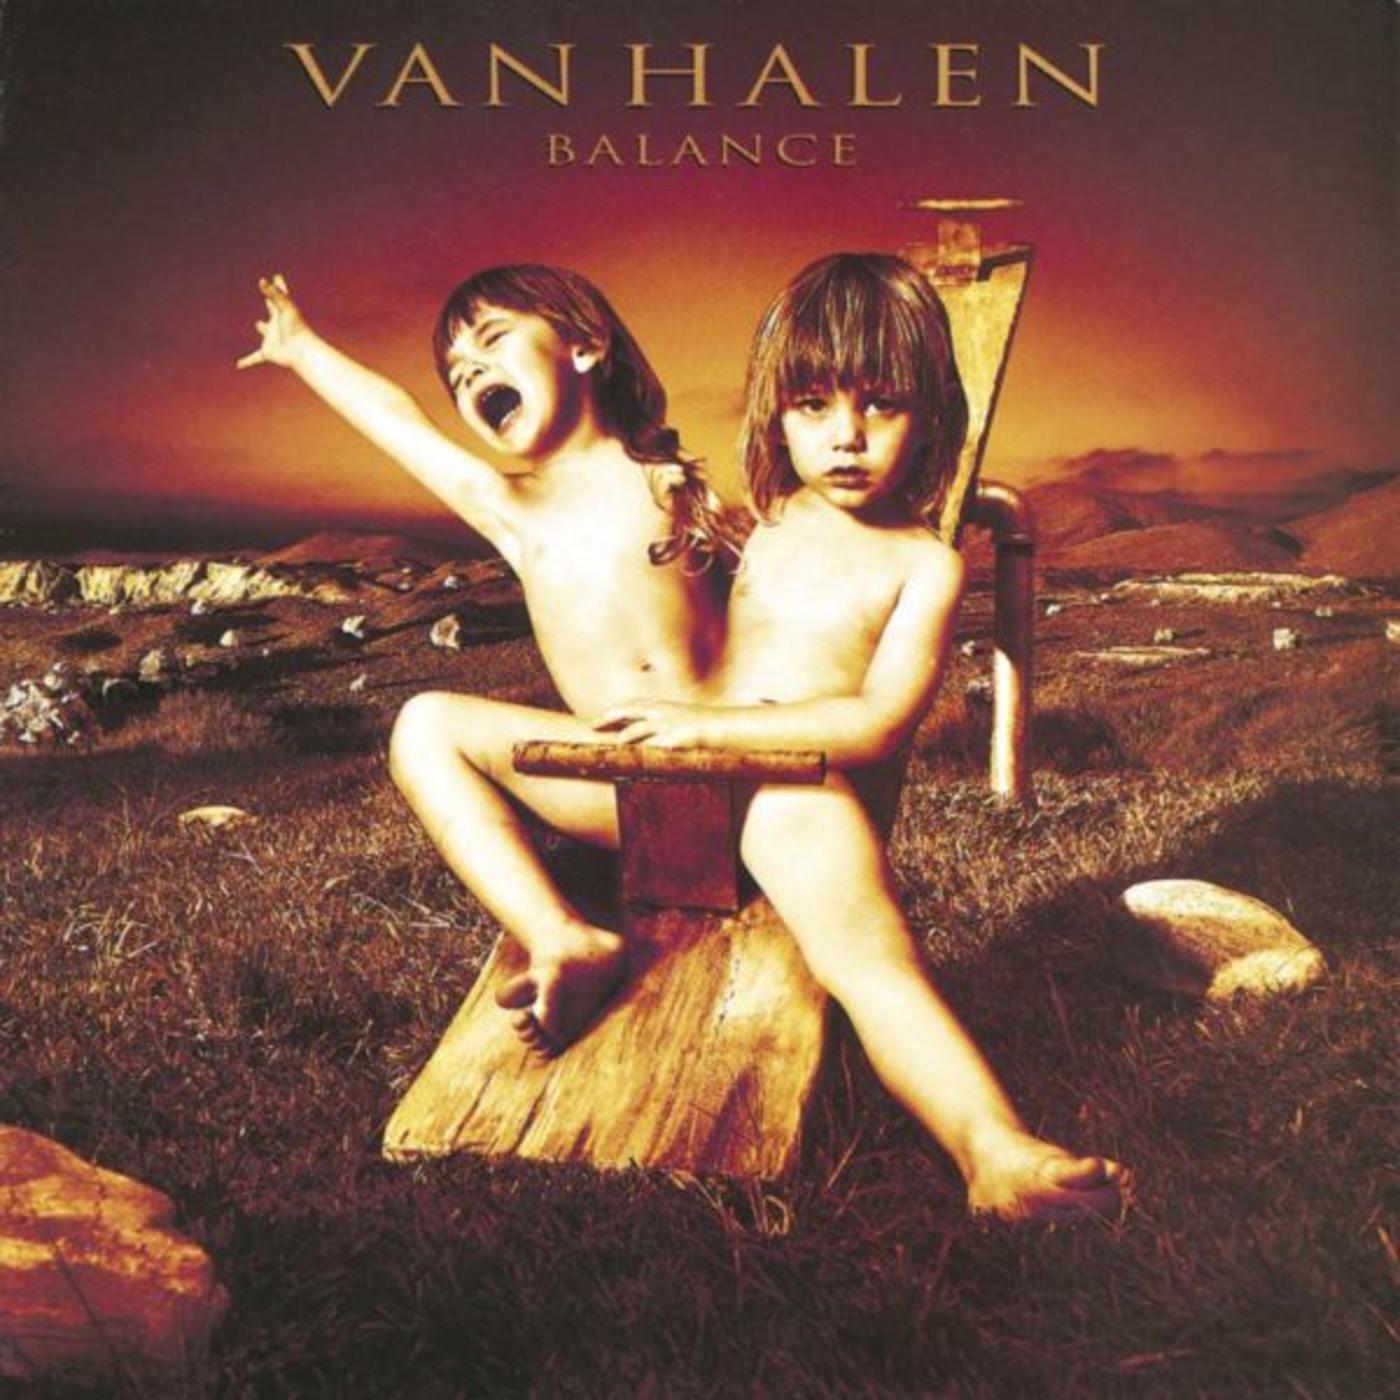 Van Halen Balance